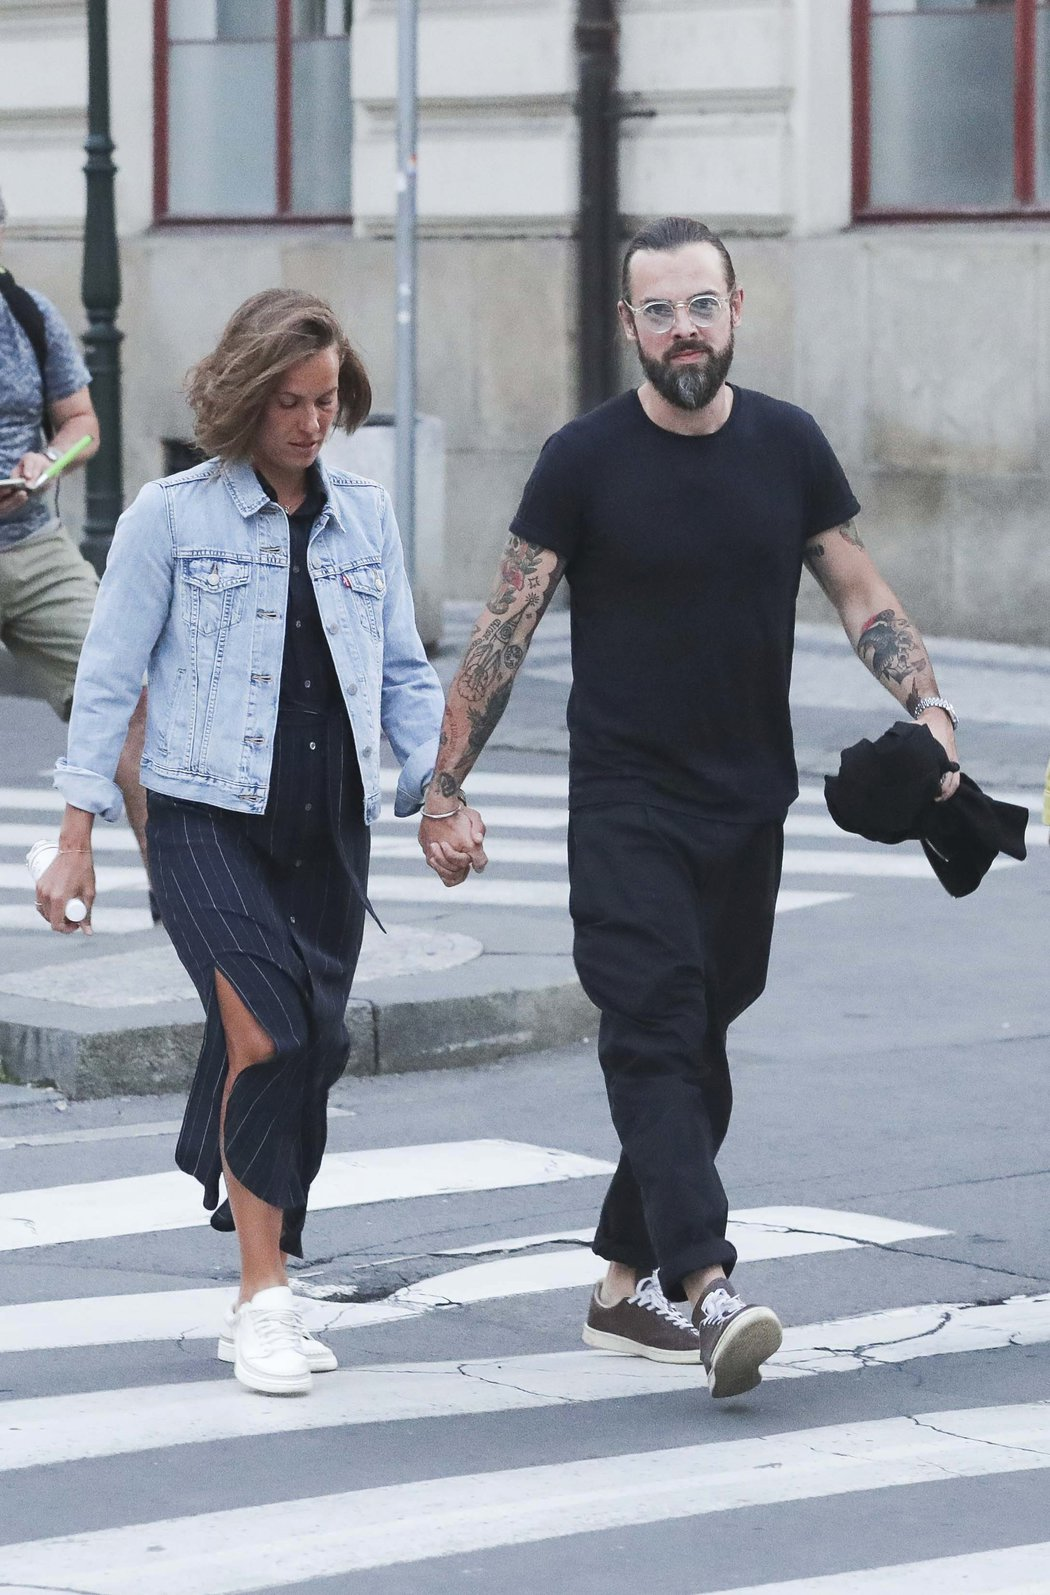 Barbora Strýcová a Petr Matějček vyrazili do centra Prahy. Nehnuli se od sebe ani na krok.